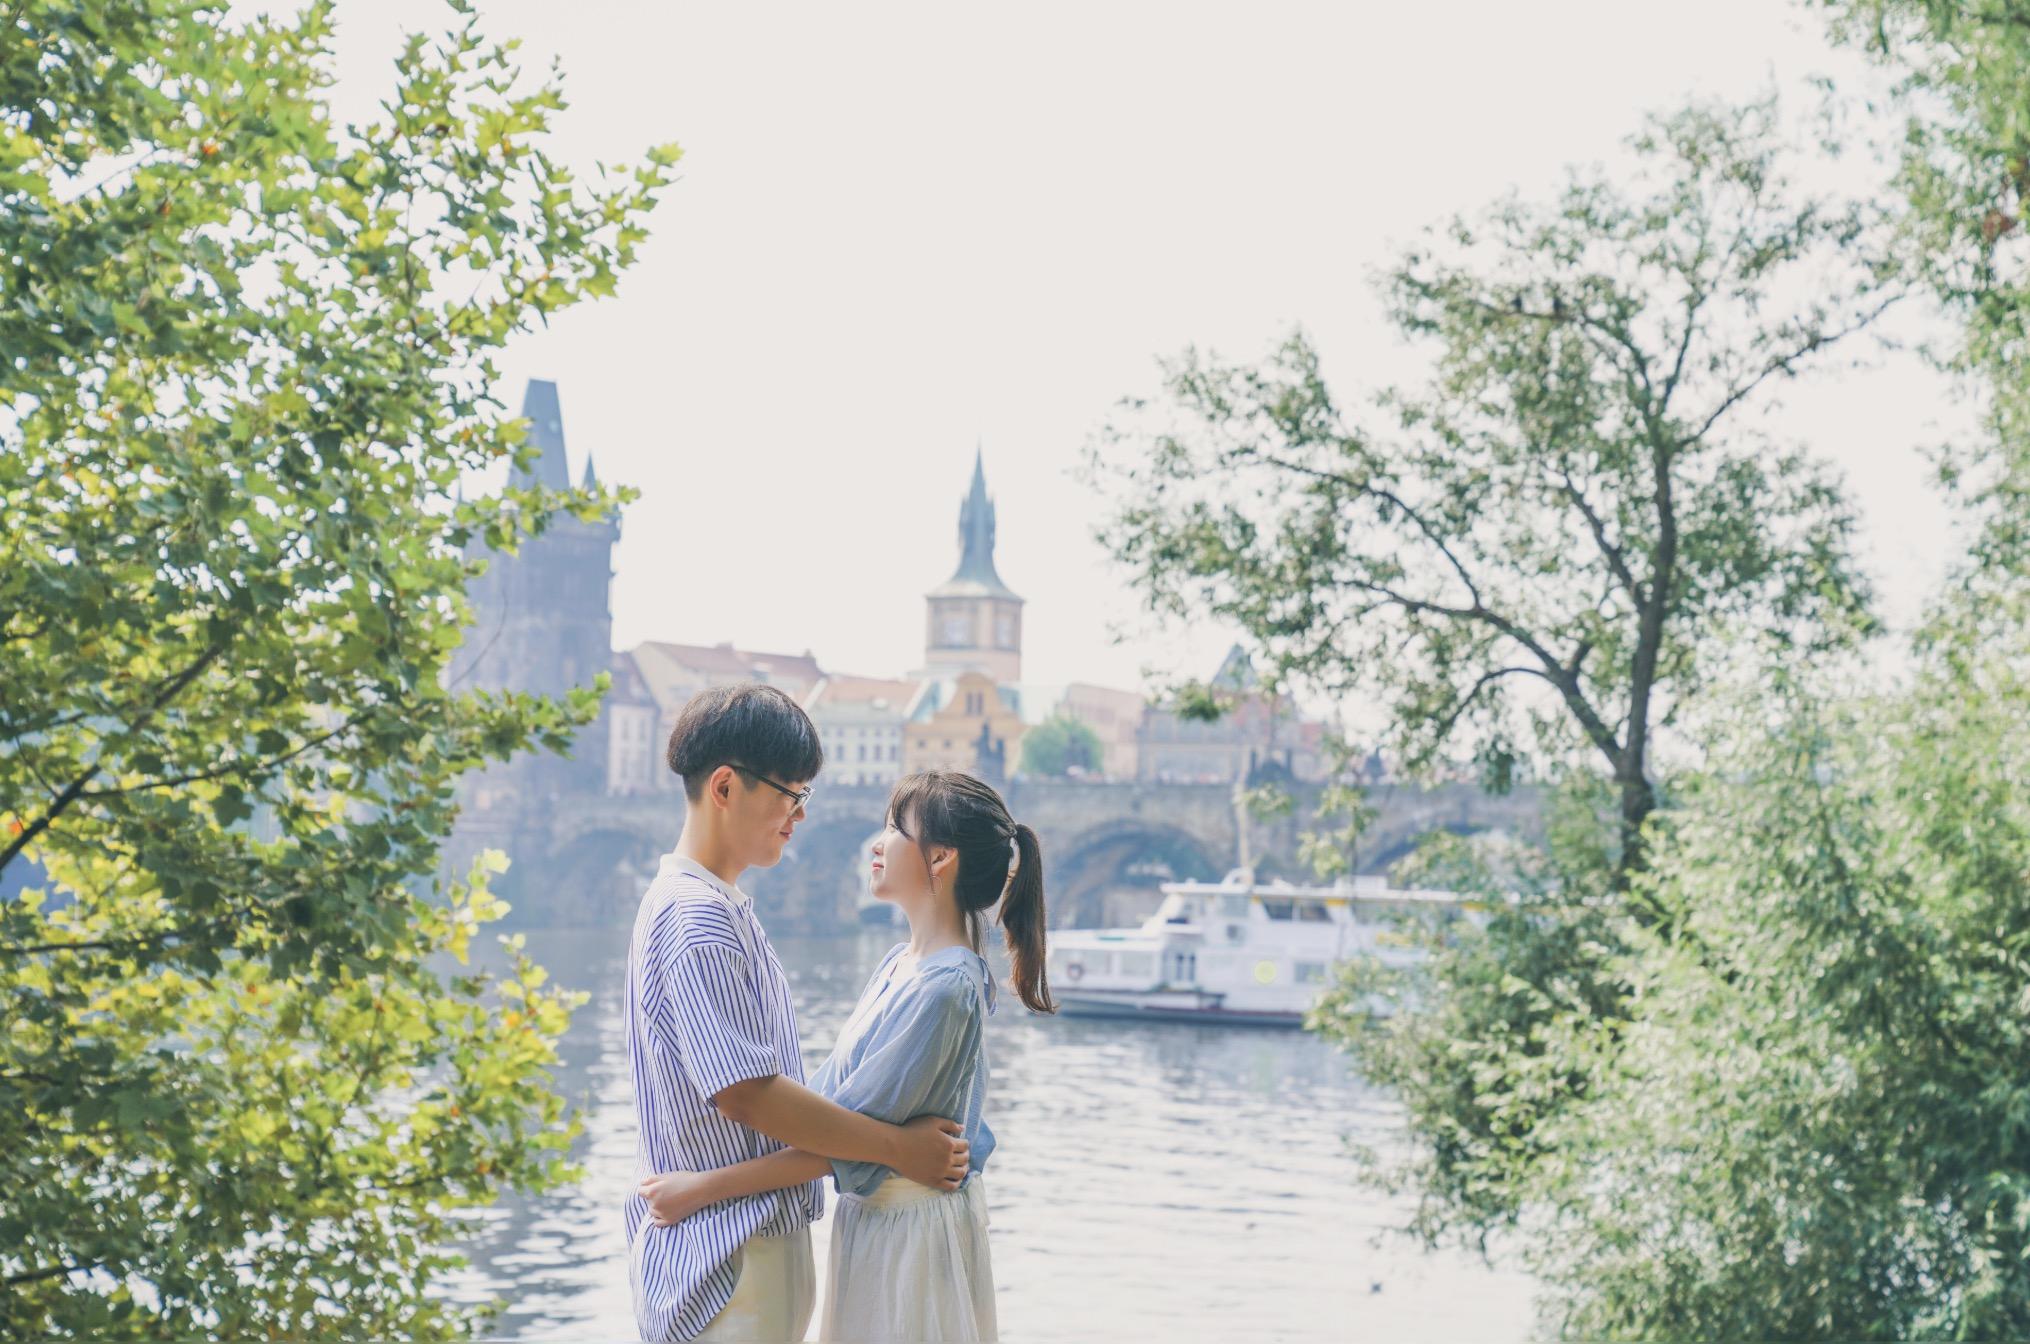 Sprazzi_Professional_Photography_Photographer_Prague_Czech-Republic_Irene_Original_40.jpg